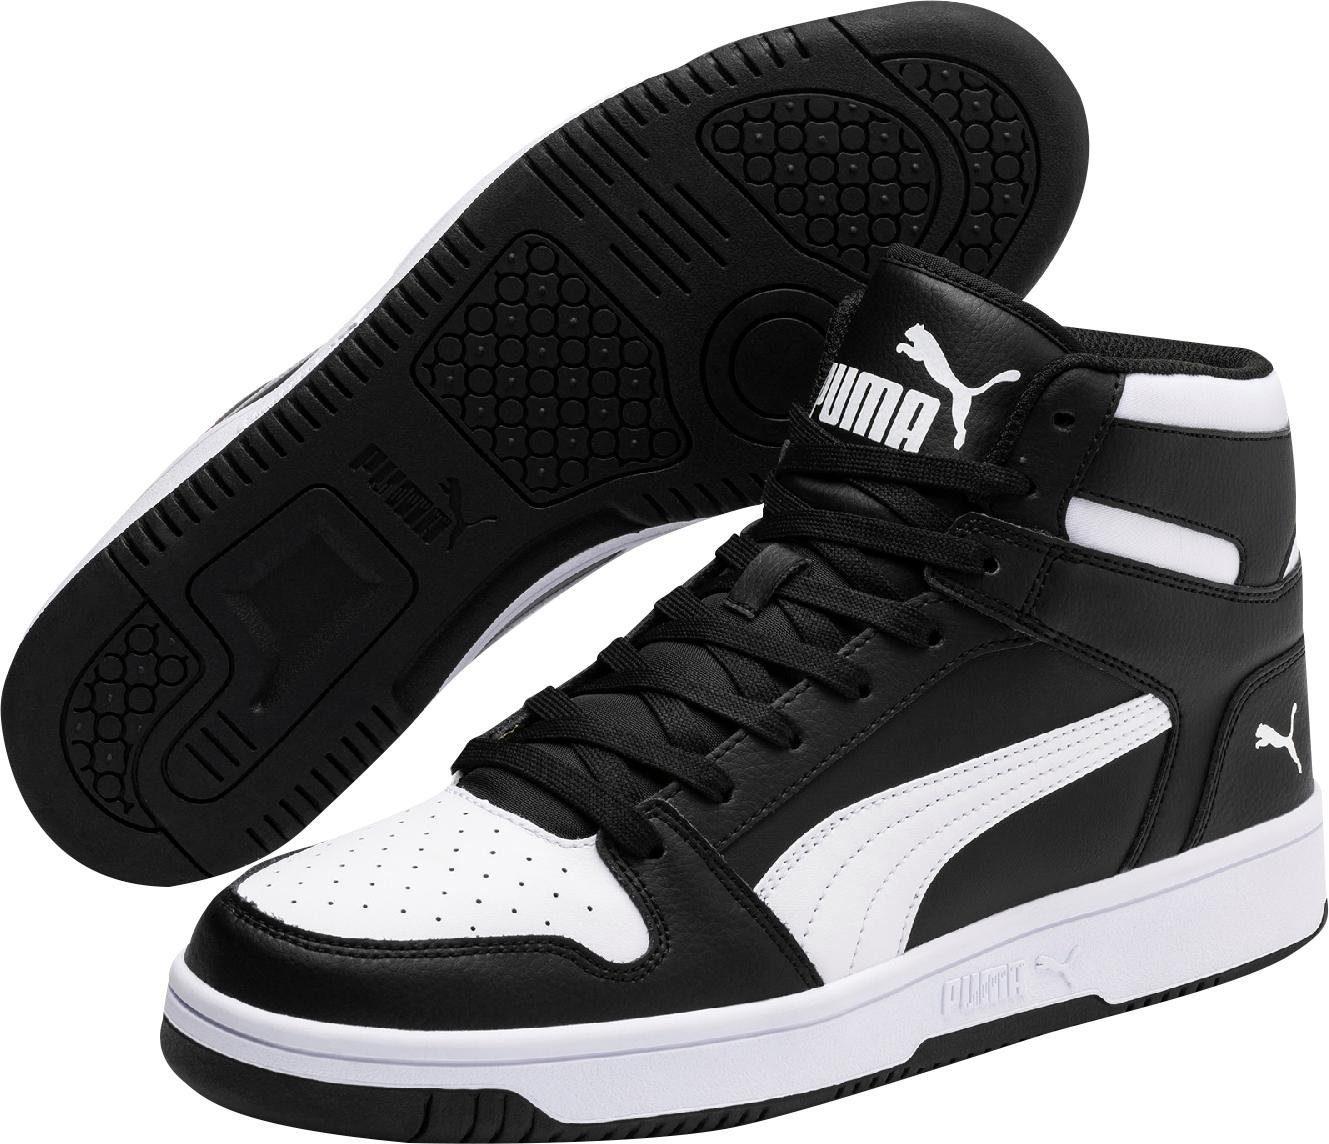 »puma Sneaker L« Kaufen Layup Online Rebound Puma POukiXZ